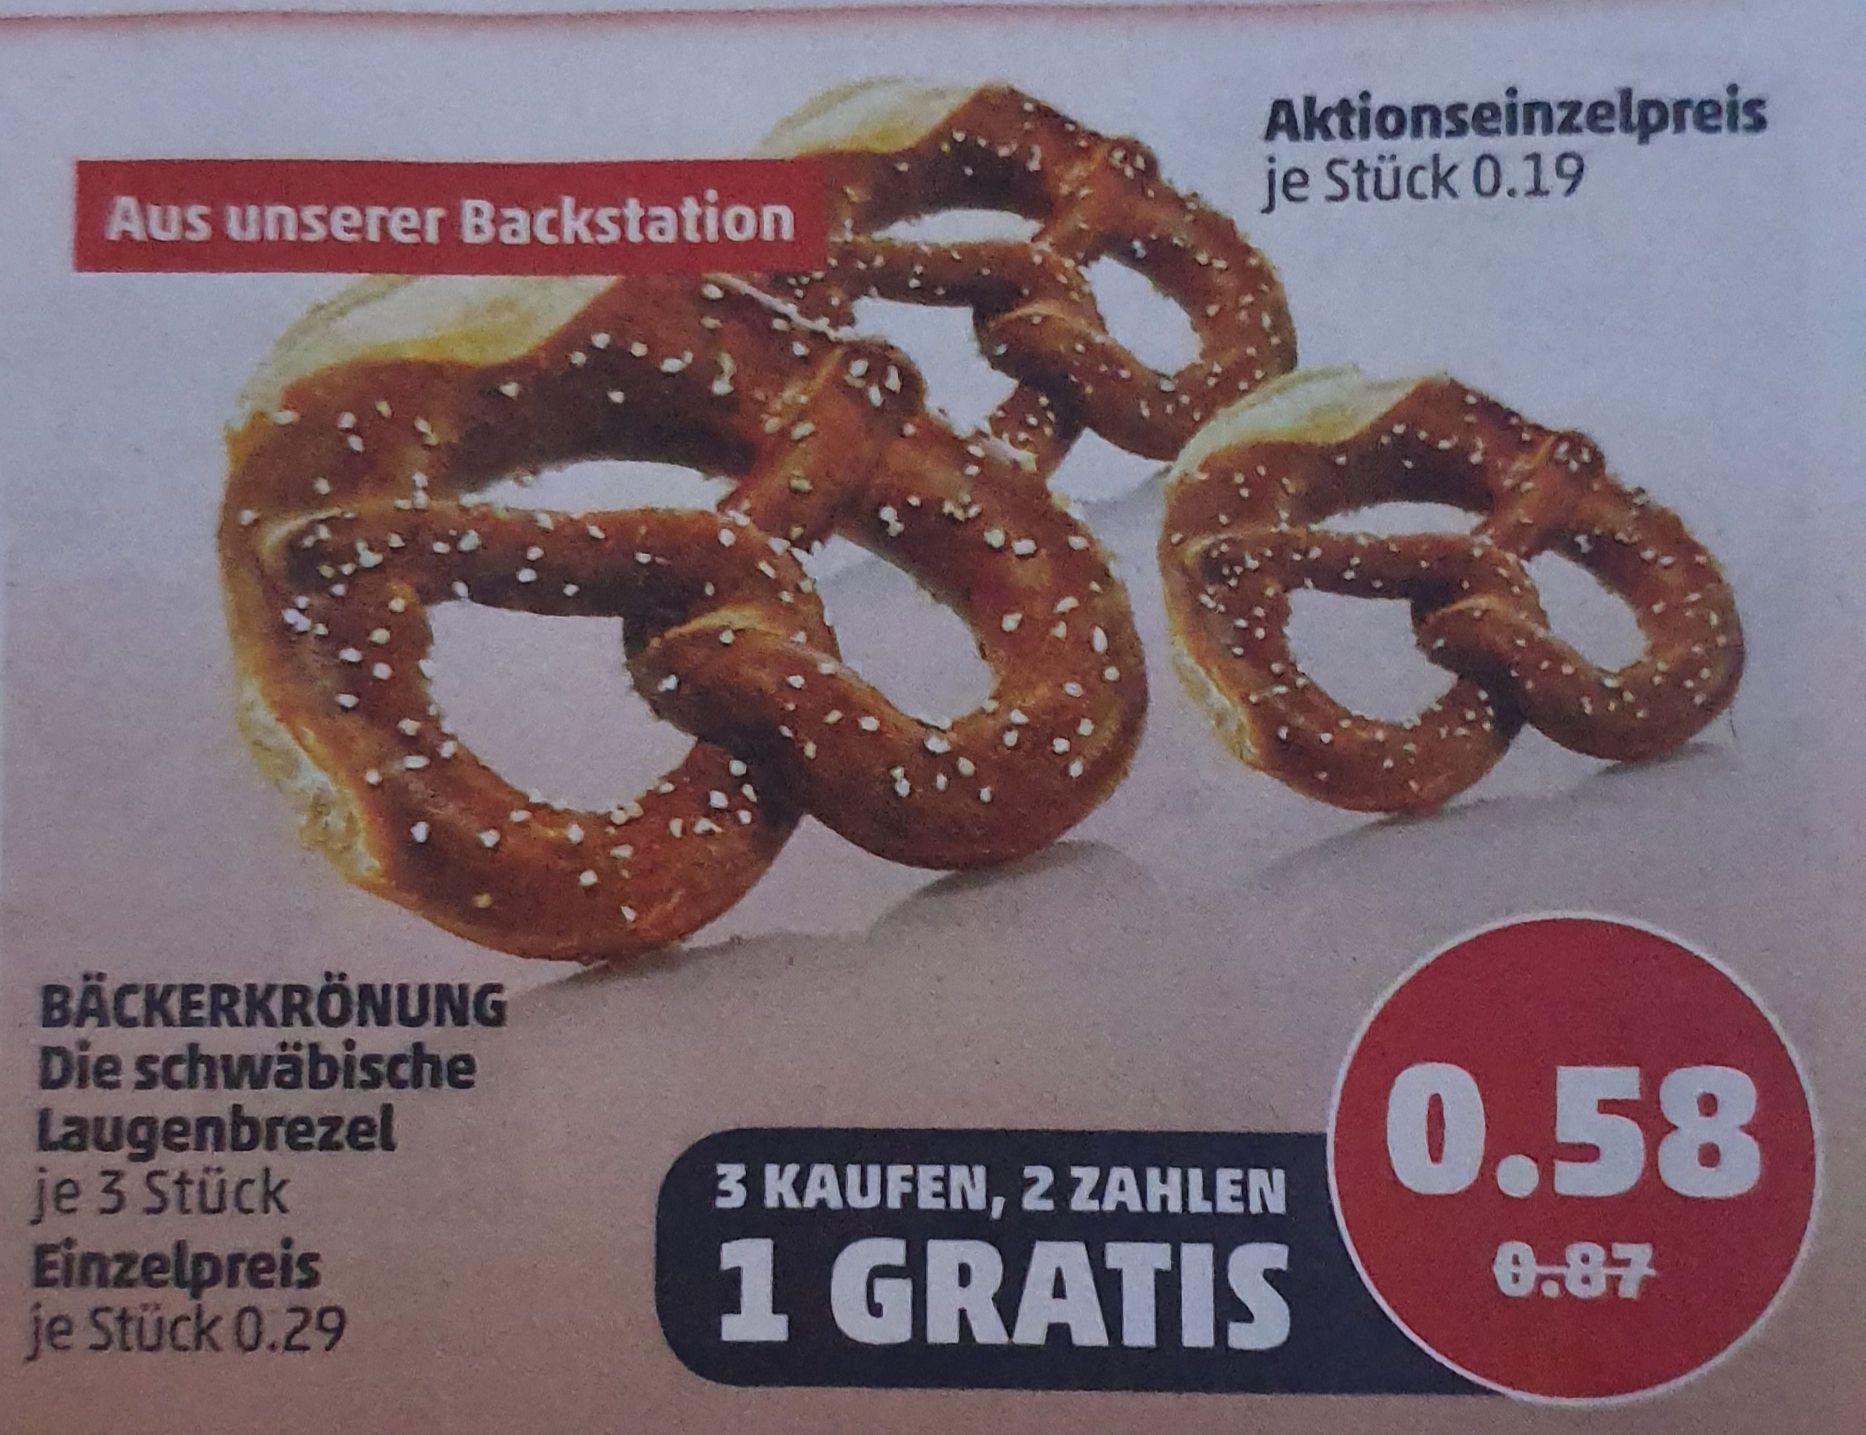 3x Laugenbrezel für 0,58€ [Penny Markt ab 23.09.]